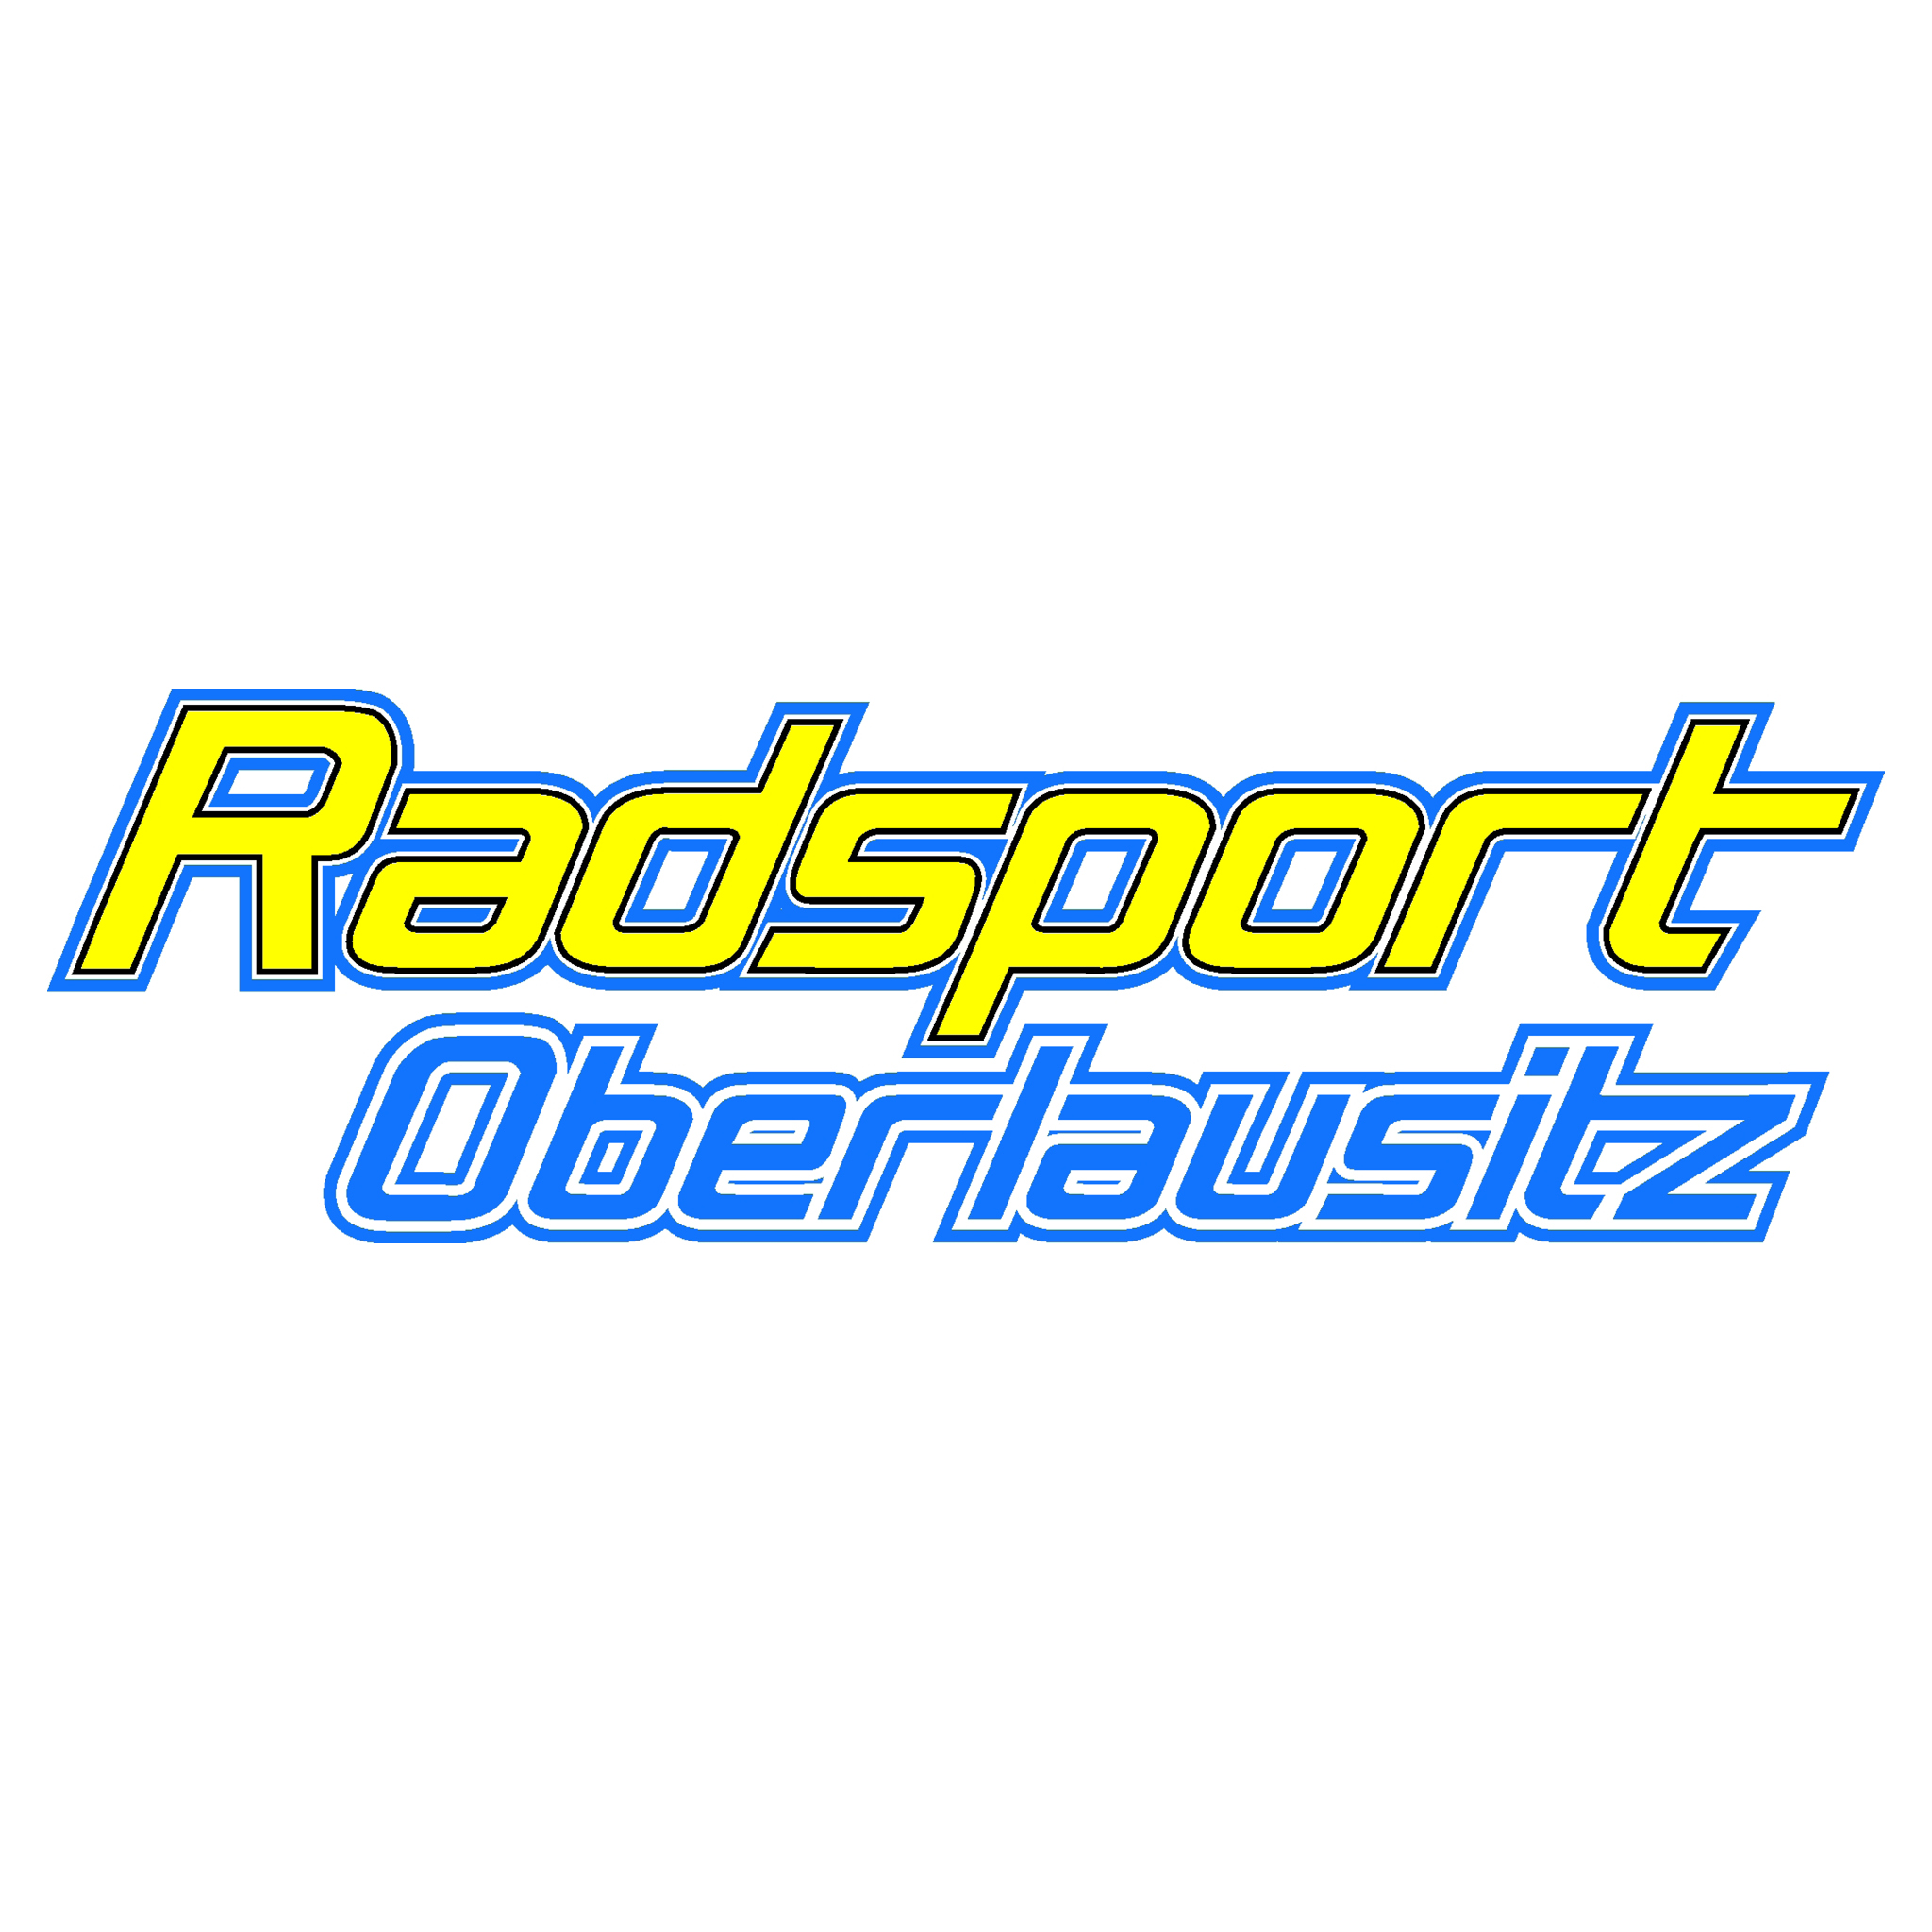 Radsport Oberlausitz